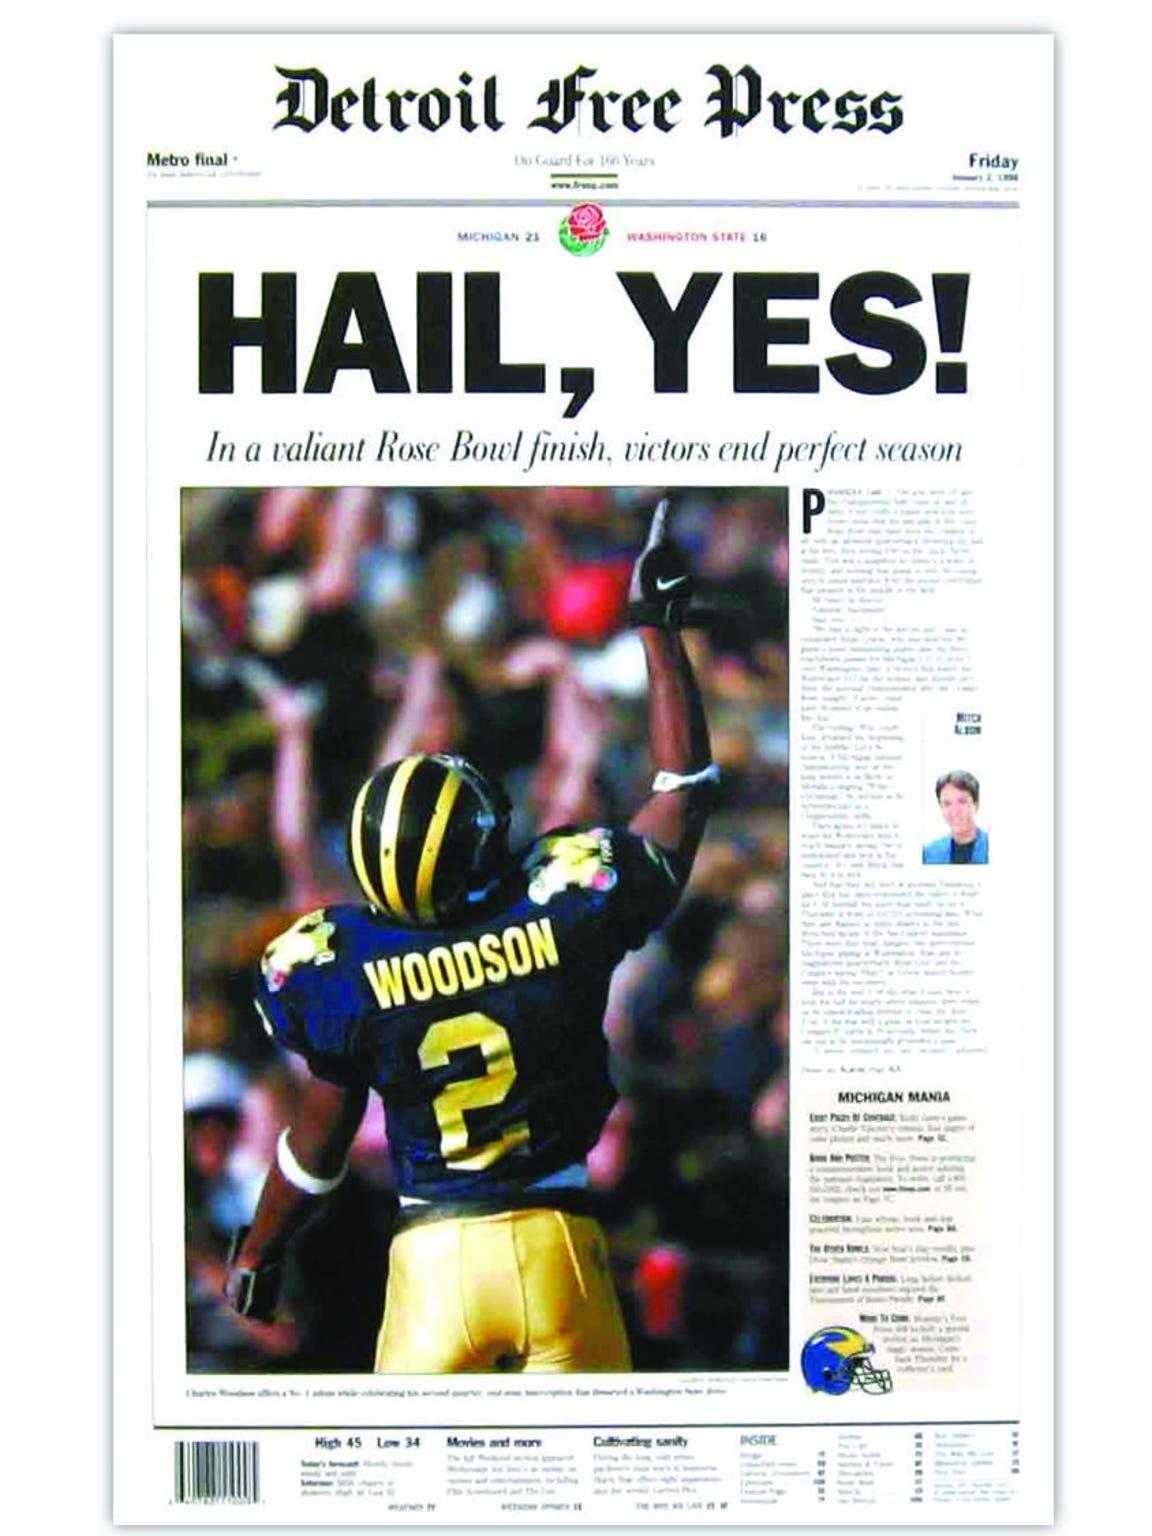 1998, Michigan wins national title.